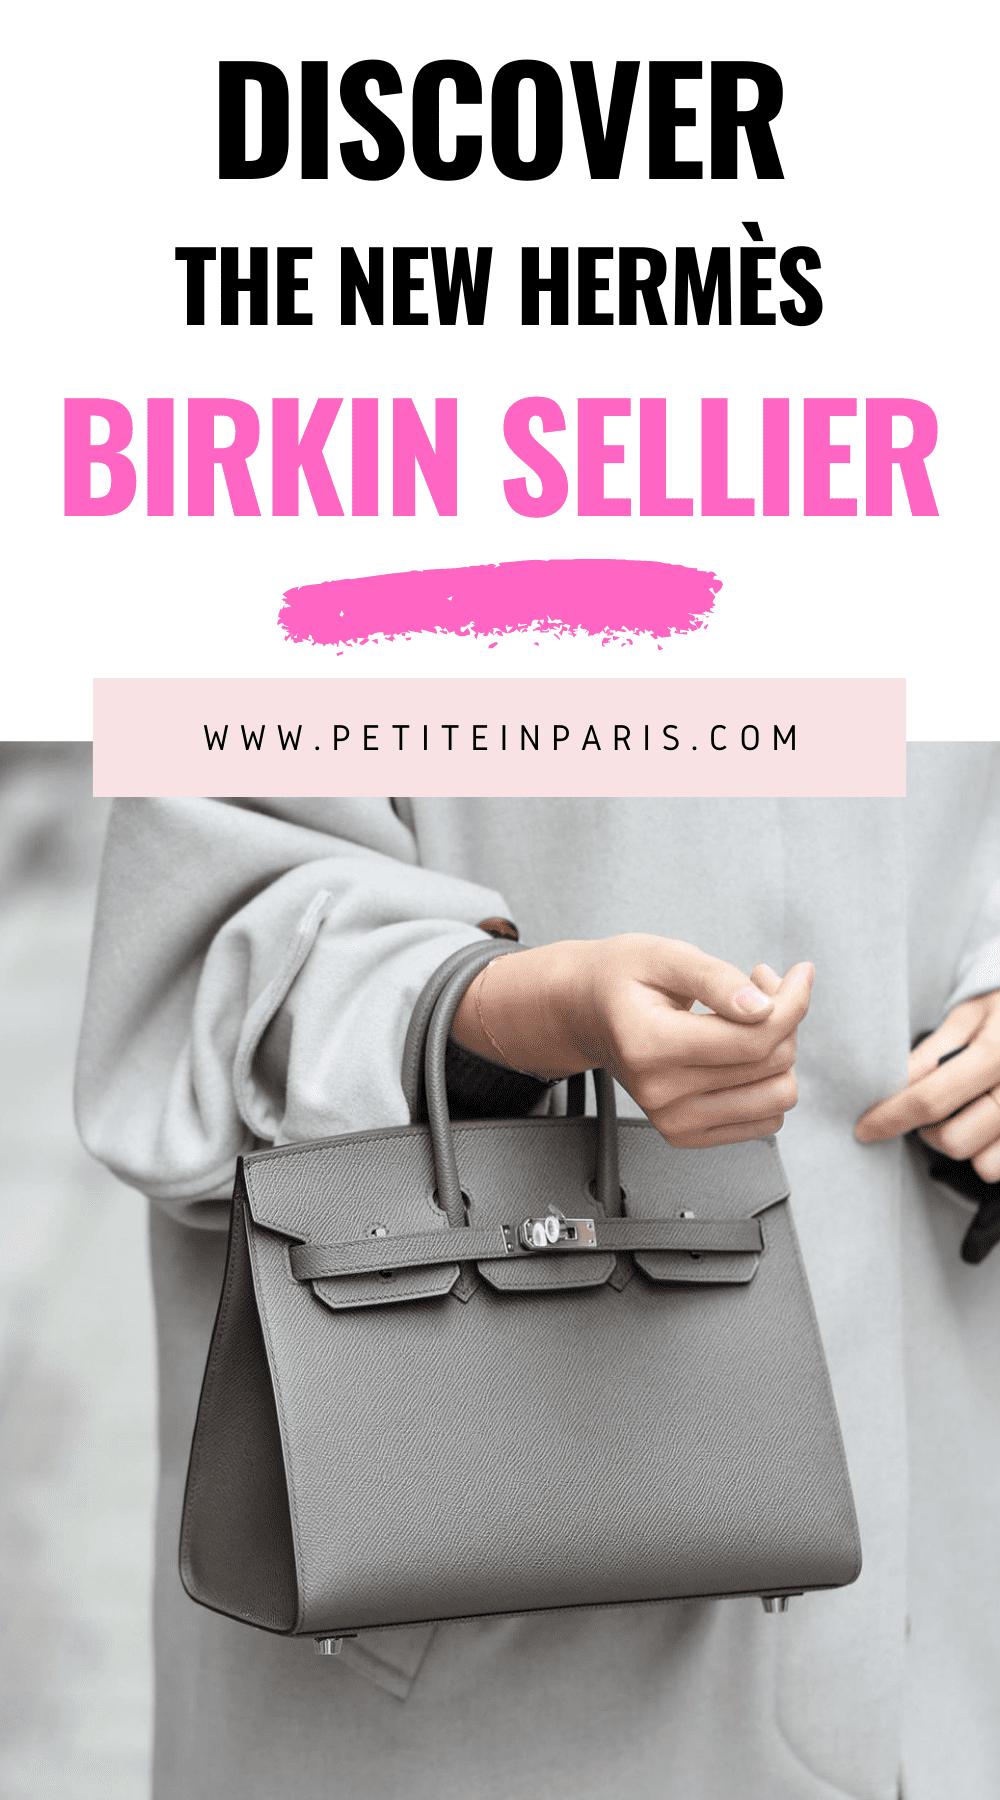 price of the birkin handbag